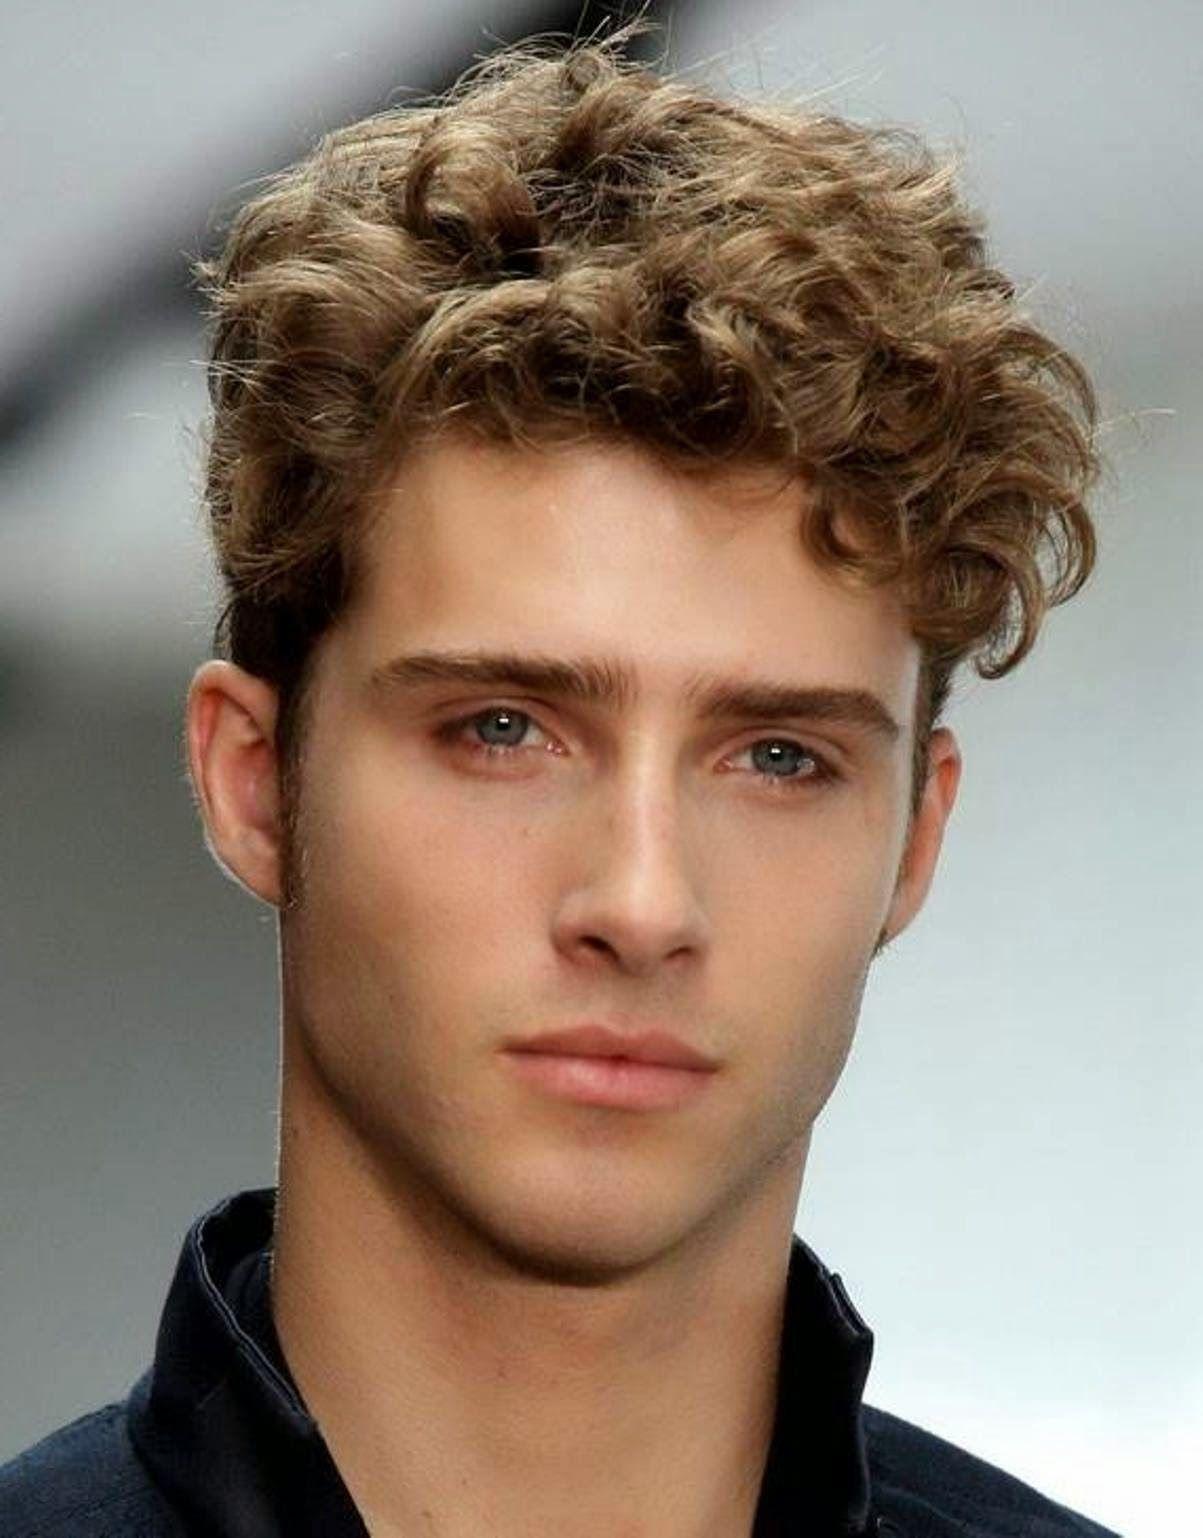 Enjoyable 1000 Images About Cuts For Jasper On Pinterest Men Curly Short Hairstyles For Black Women Fulllsitofus